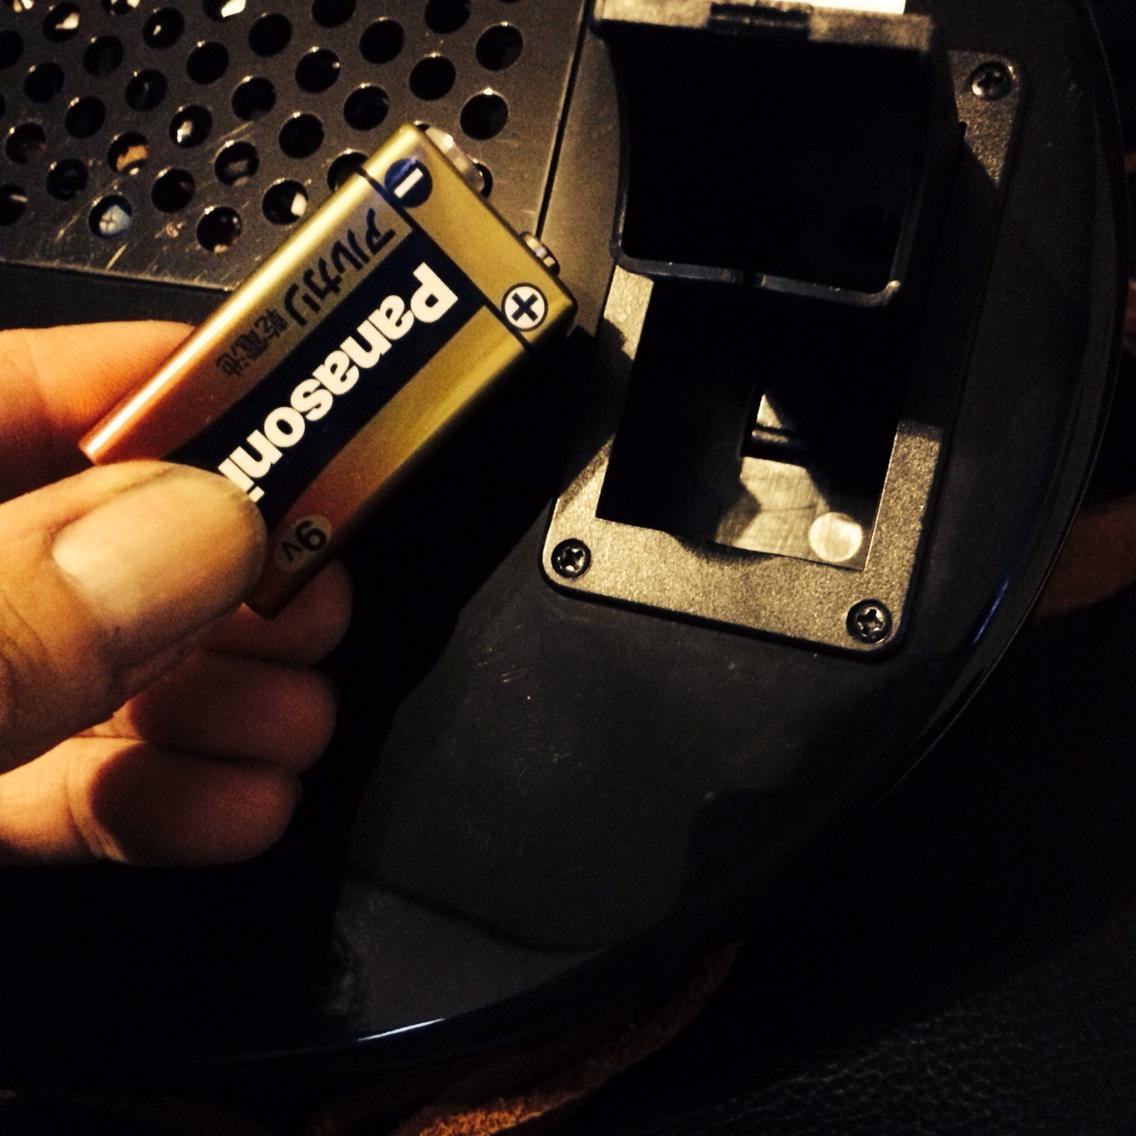 Evernote Camera Roll 20140722 232805.jpg